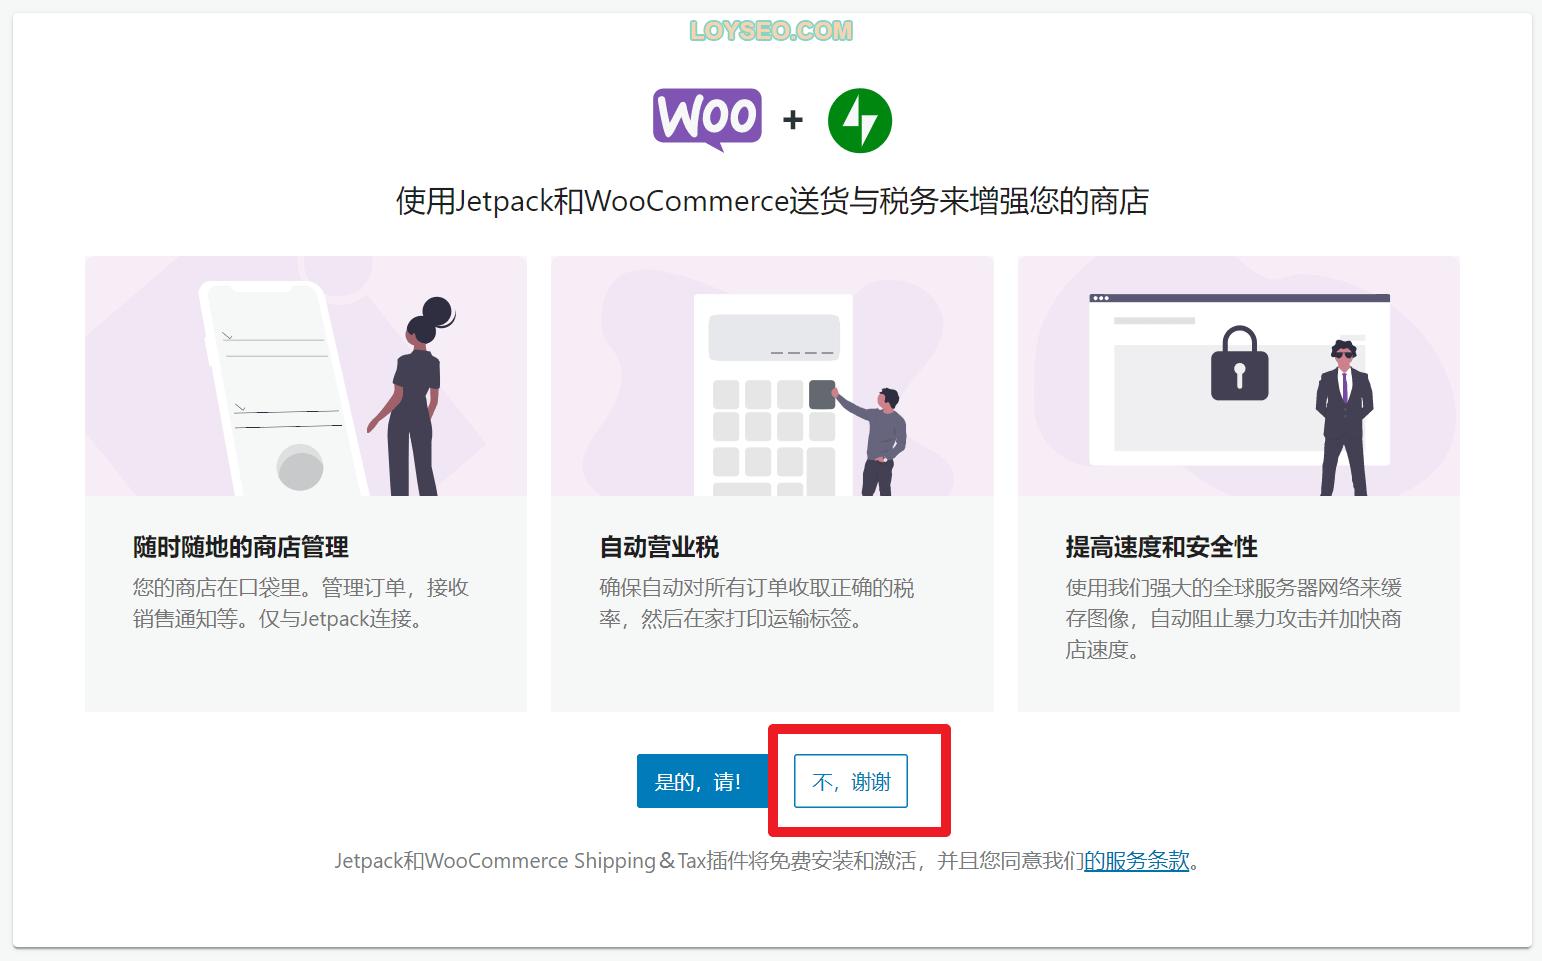 image 59 - 如何安装WooCommerce